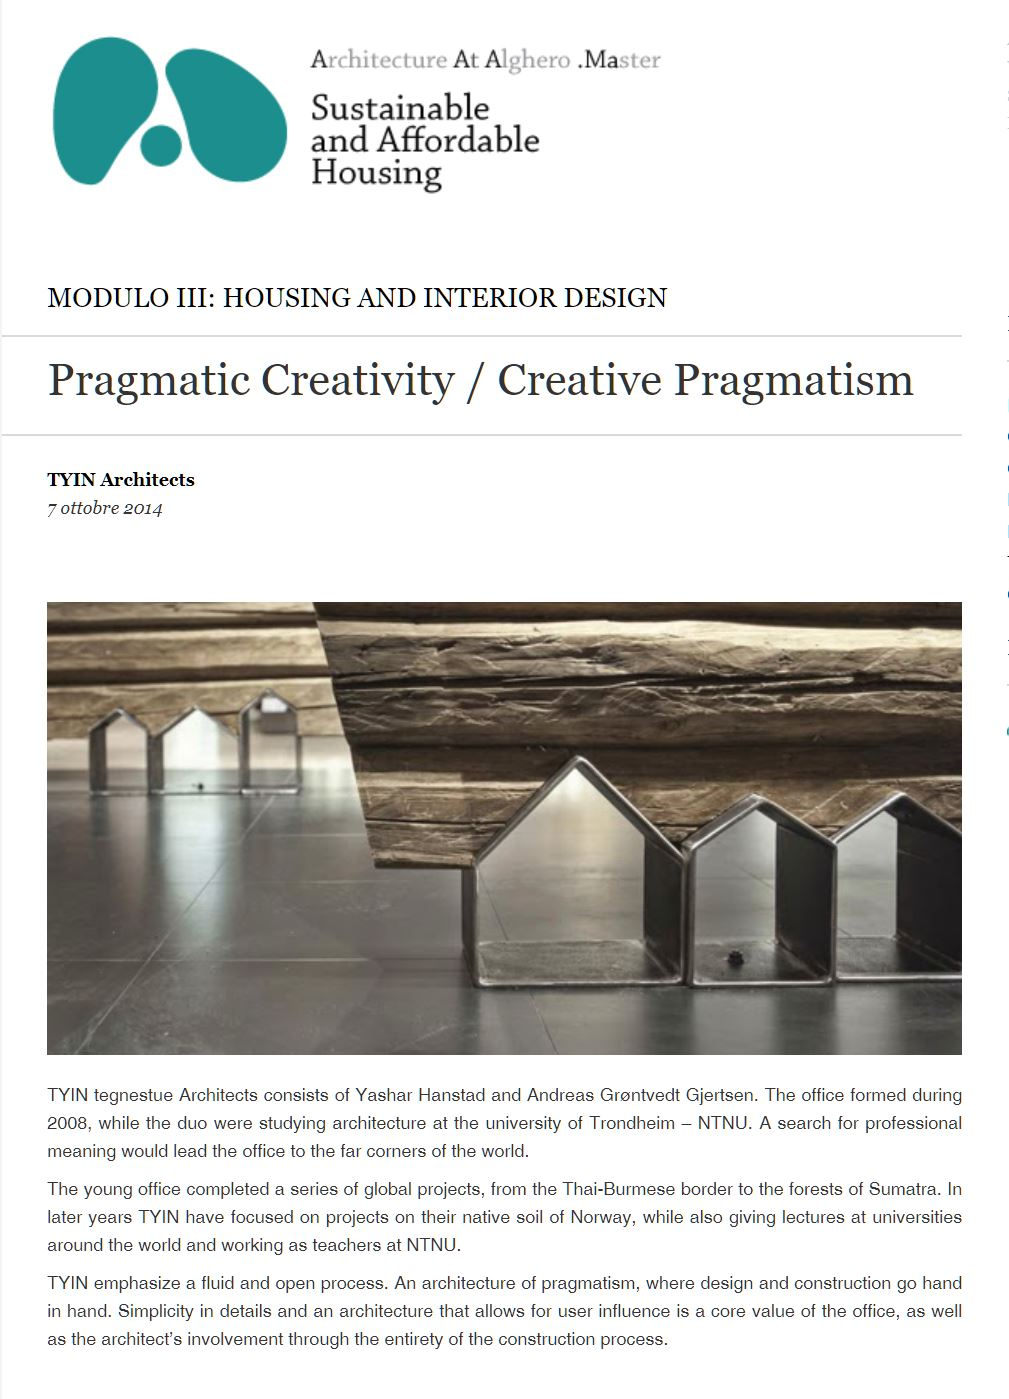 Pragmatic Creativity / Creative Pragmatism